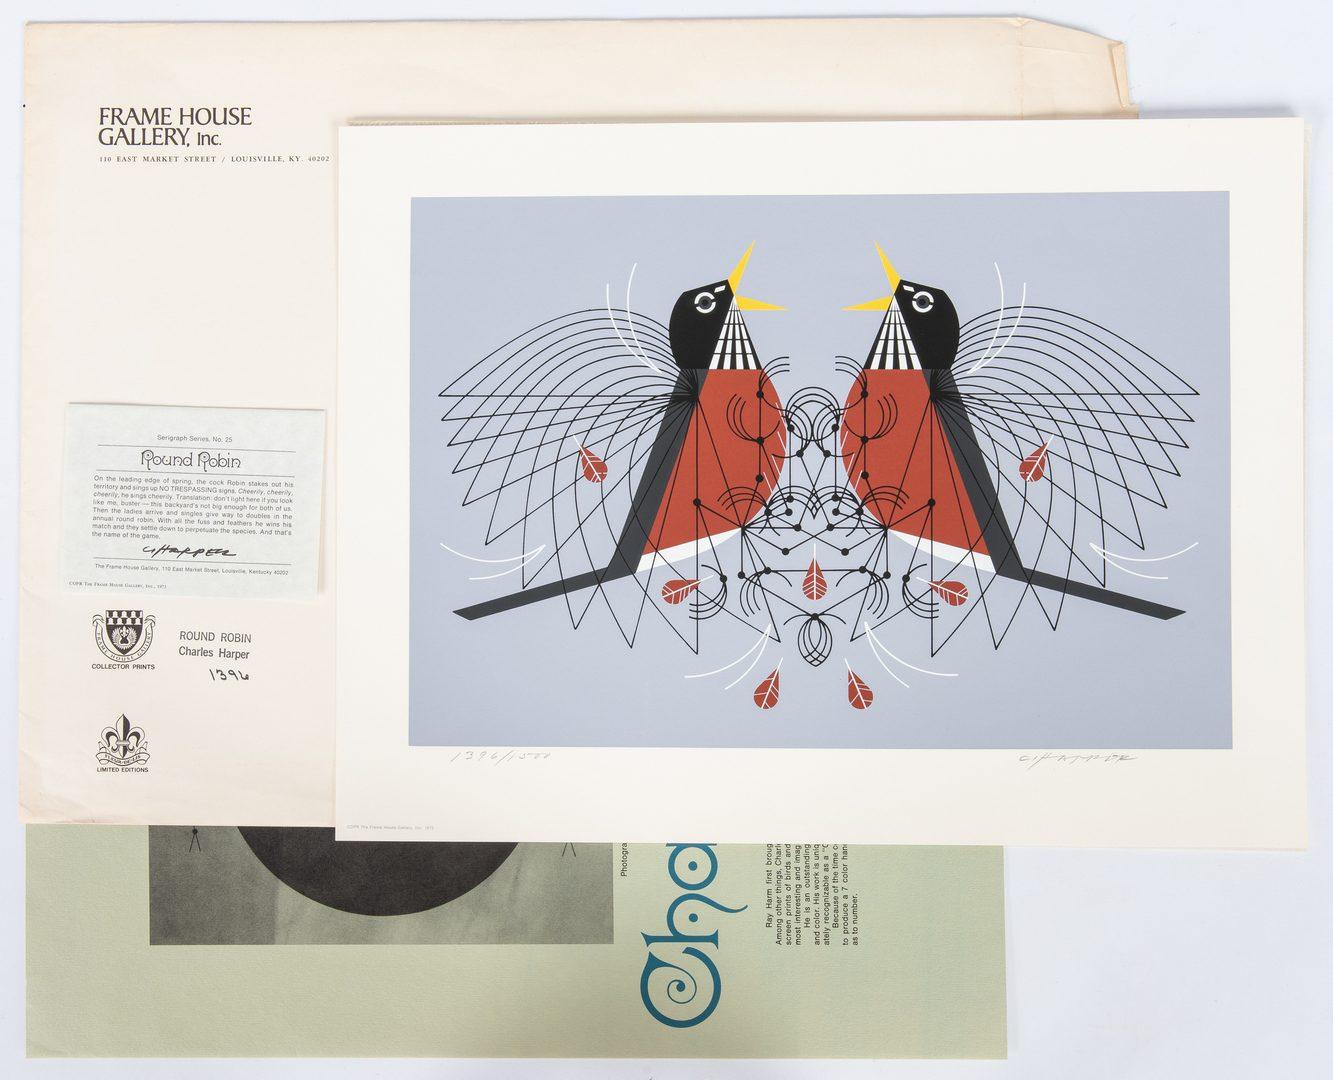 Lot 544: 4 Charley Harper Serigraphs, incl. Bear, Turtle, & Birds